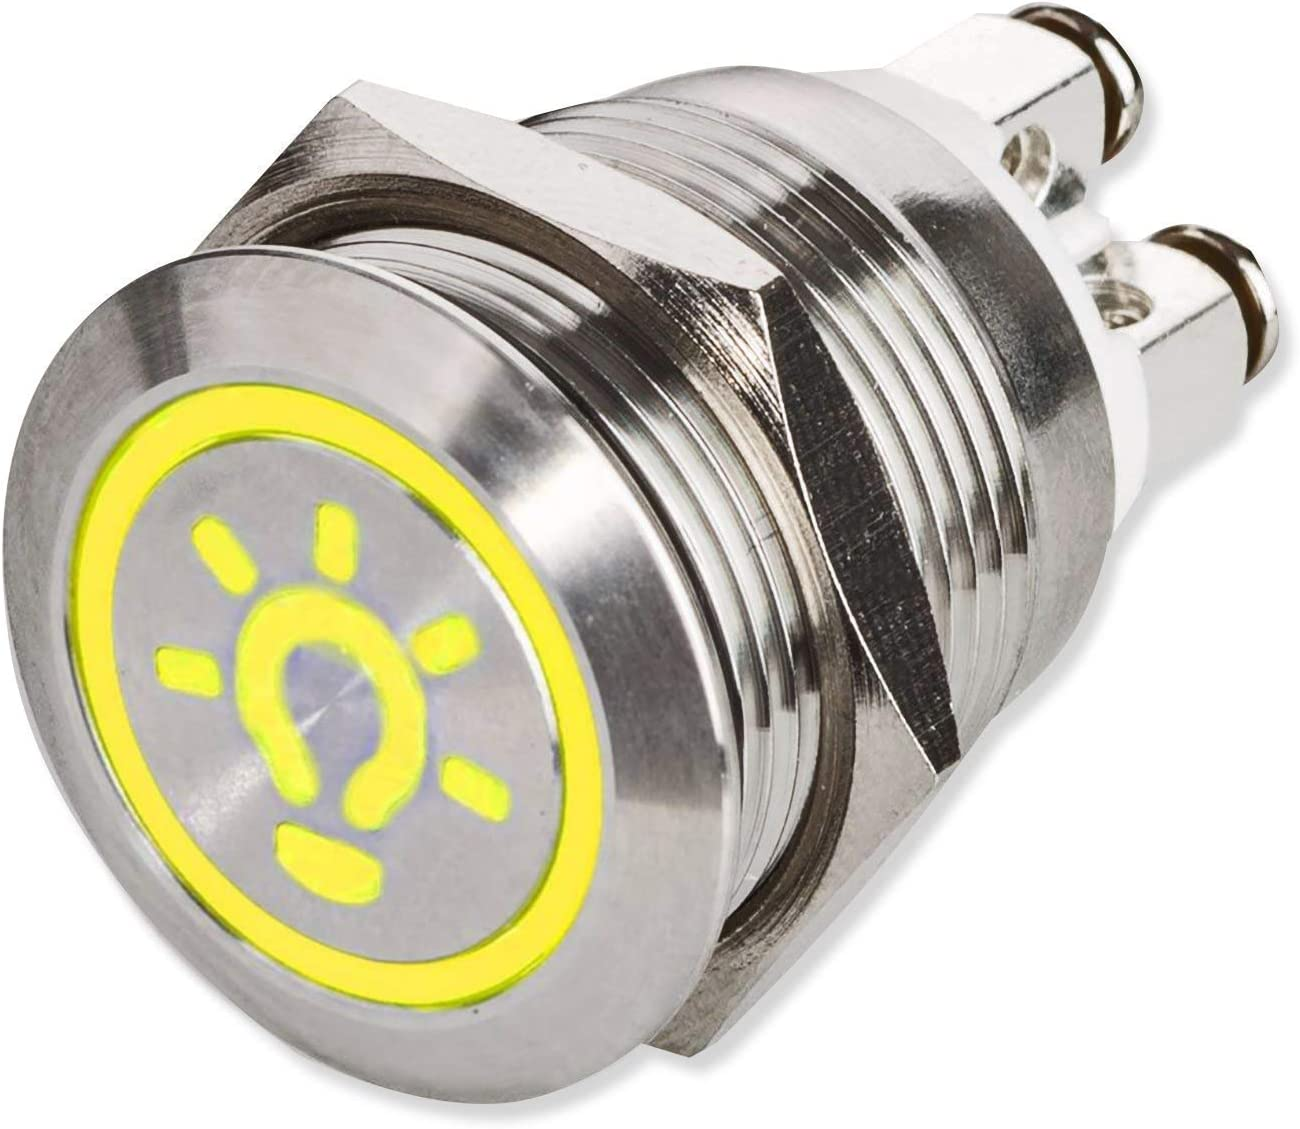 METZLER IP67 DEL Bouton Poussoir Bell symbole acier inoxydable 19 mm Vis De Contact Rouge